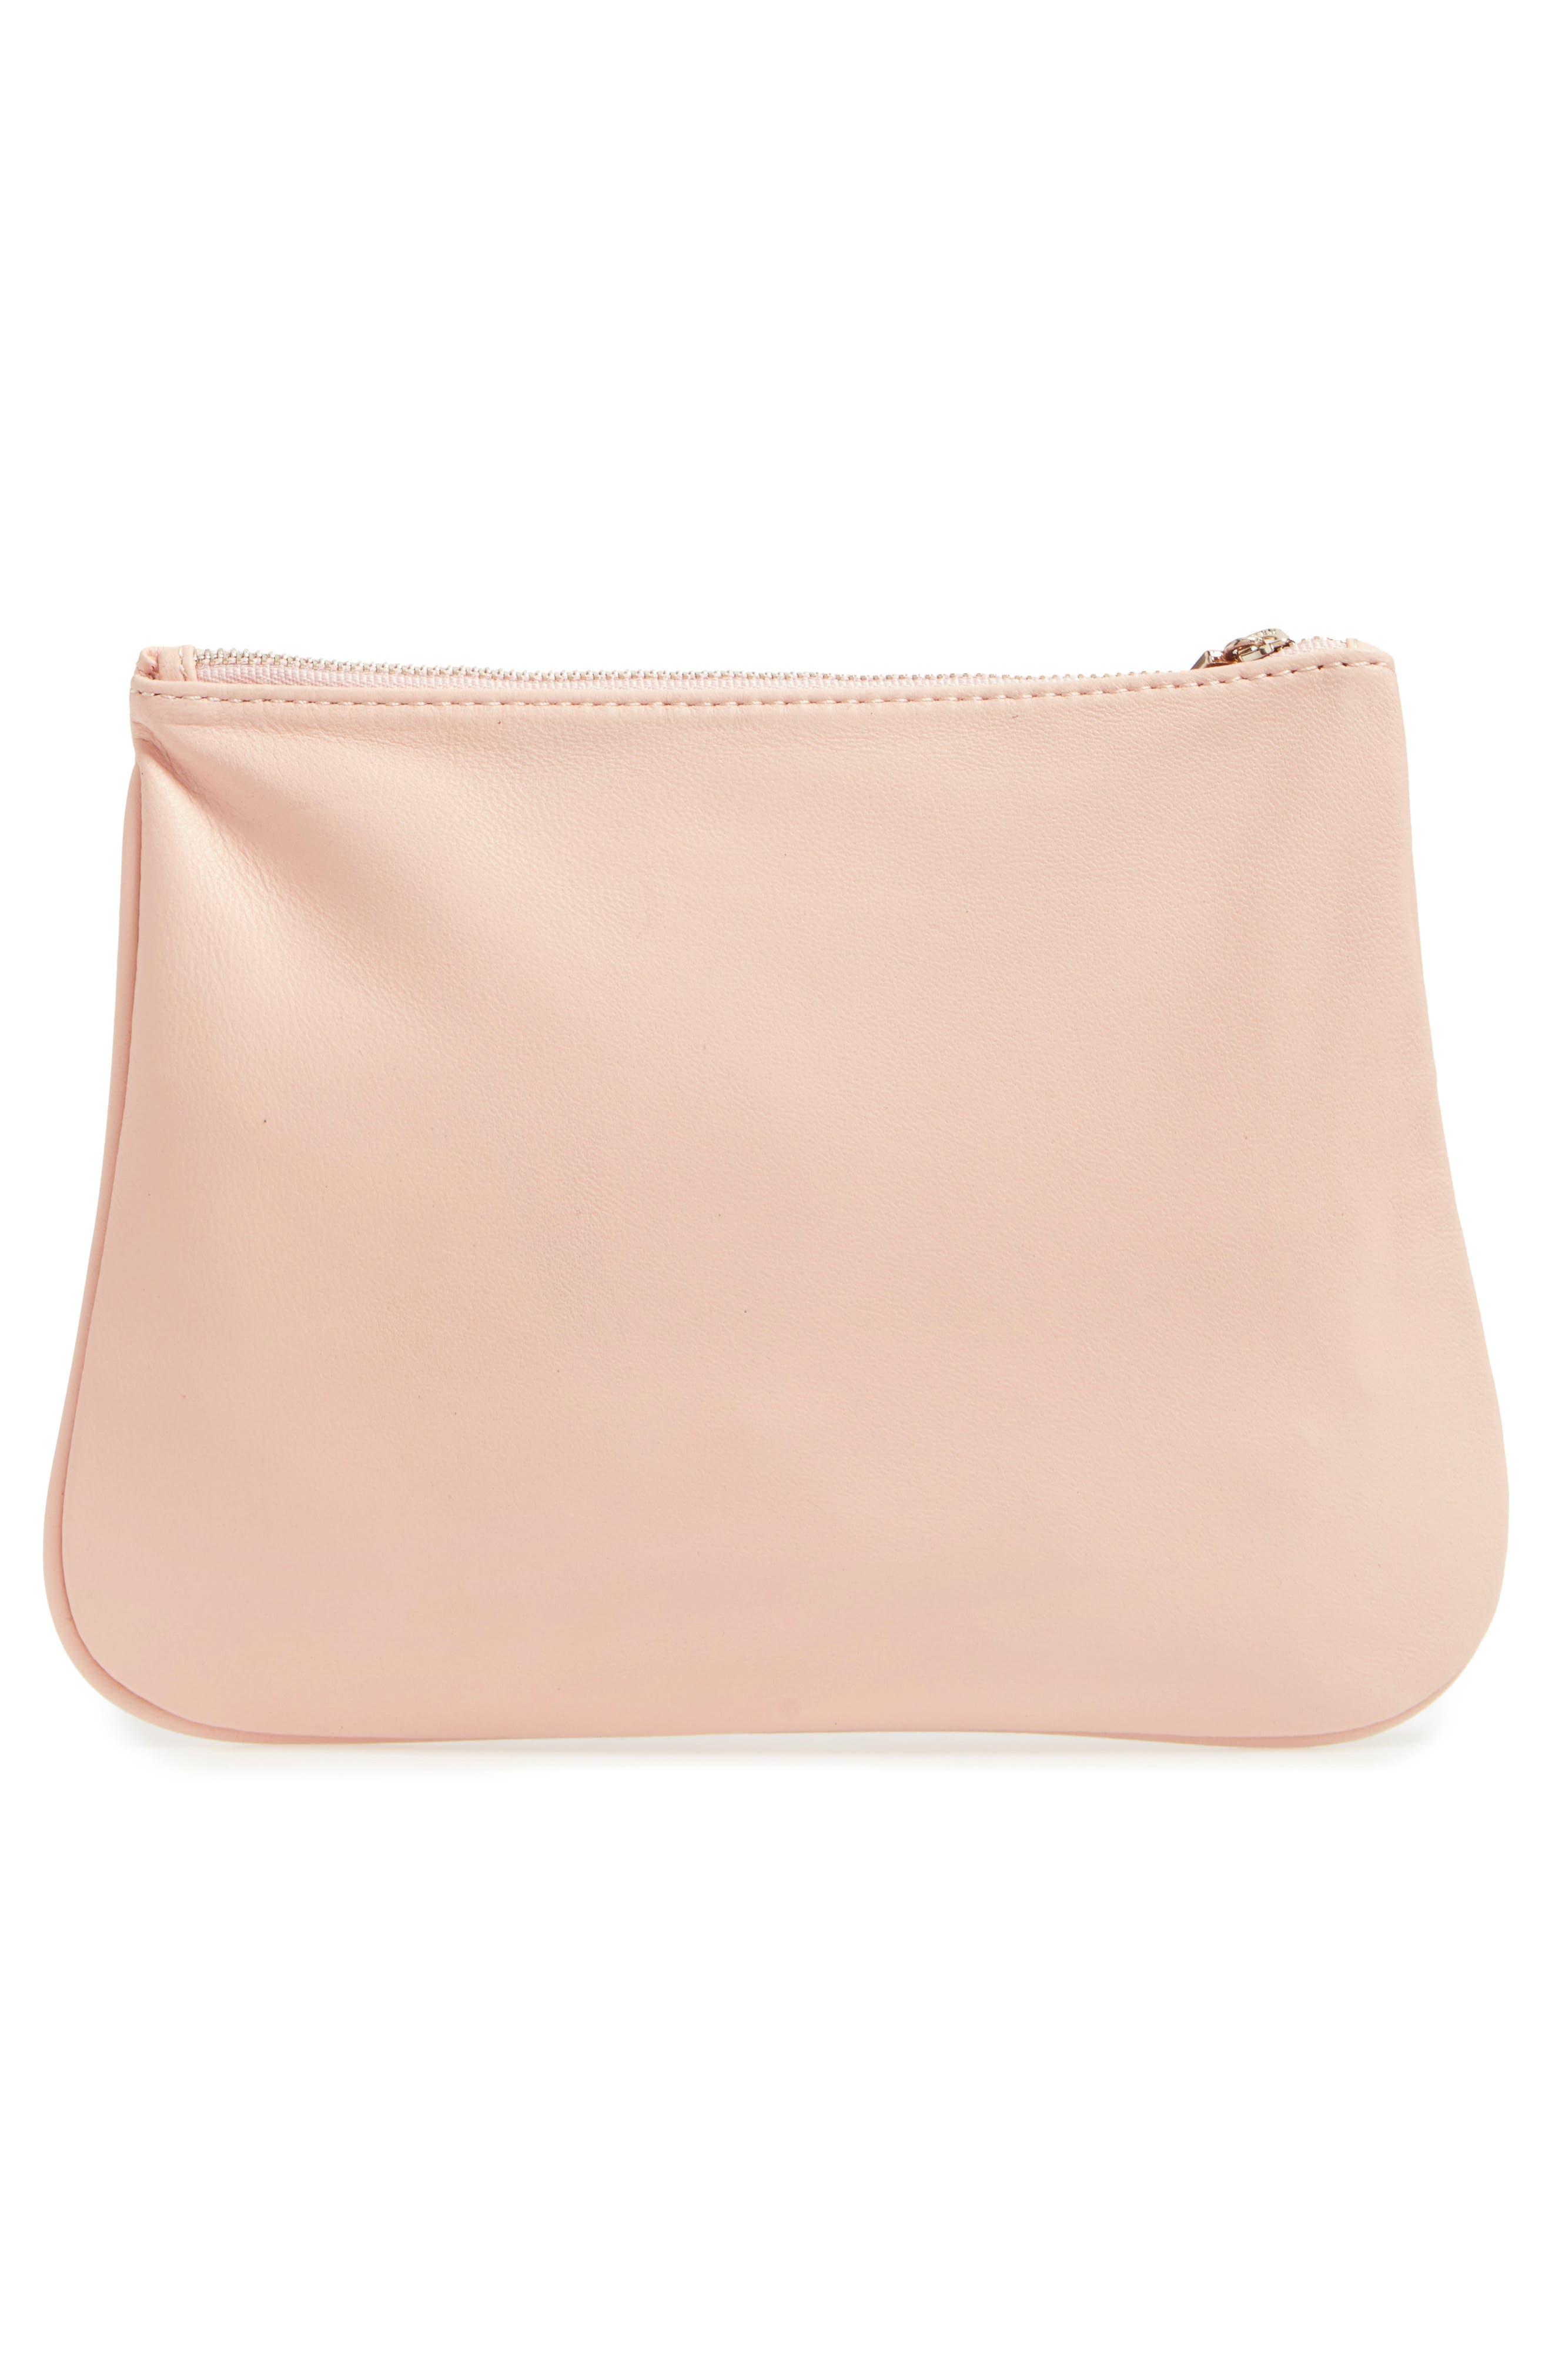 'IT' Cosmetics Bag,                             Alternate thumbnail 3, color,